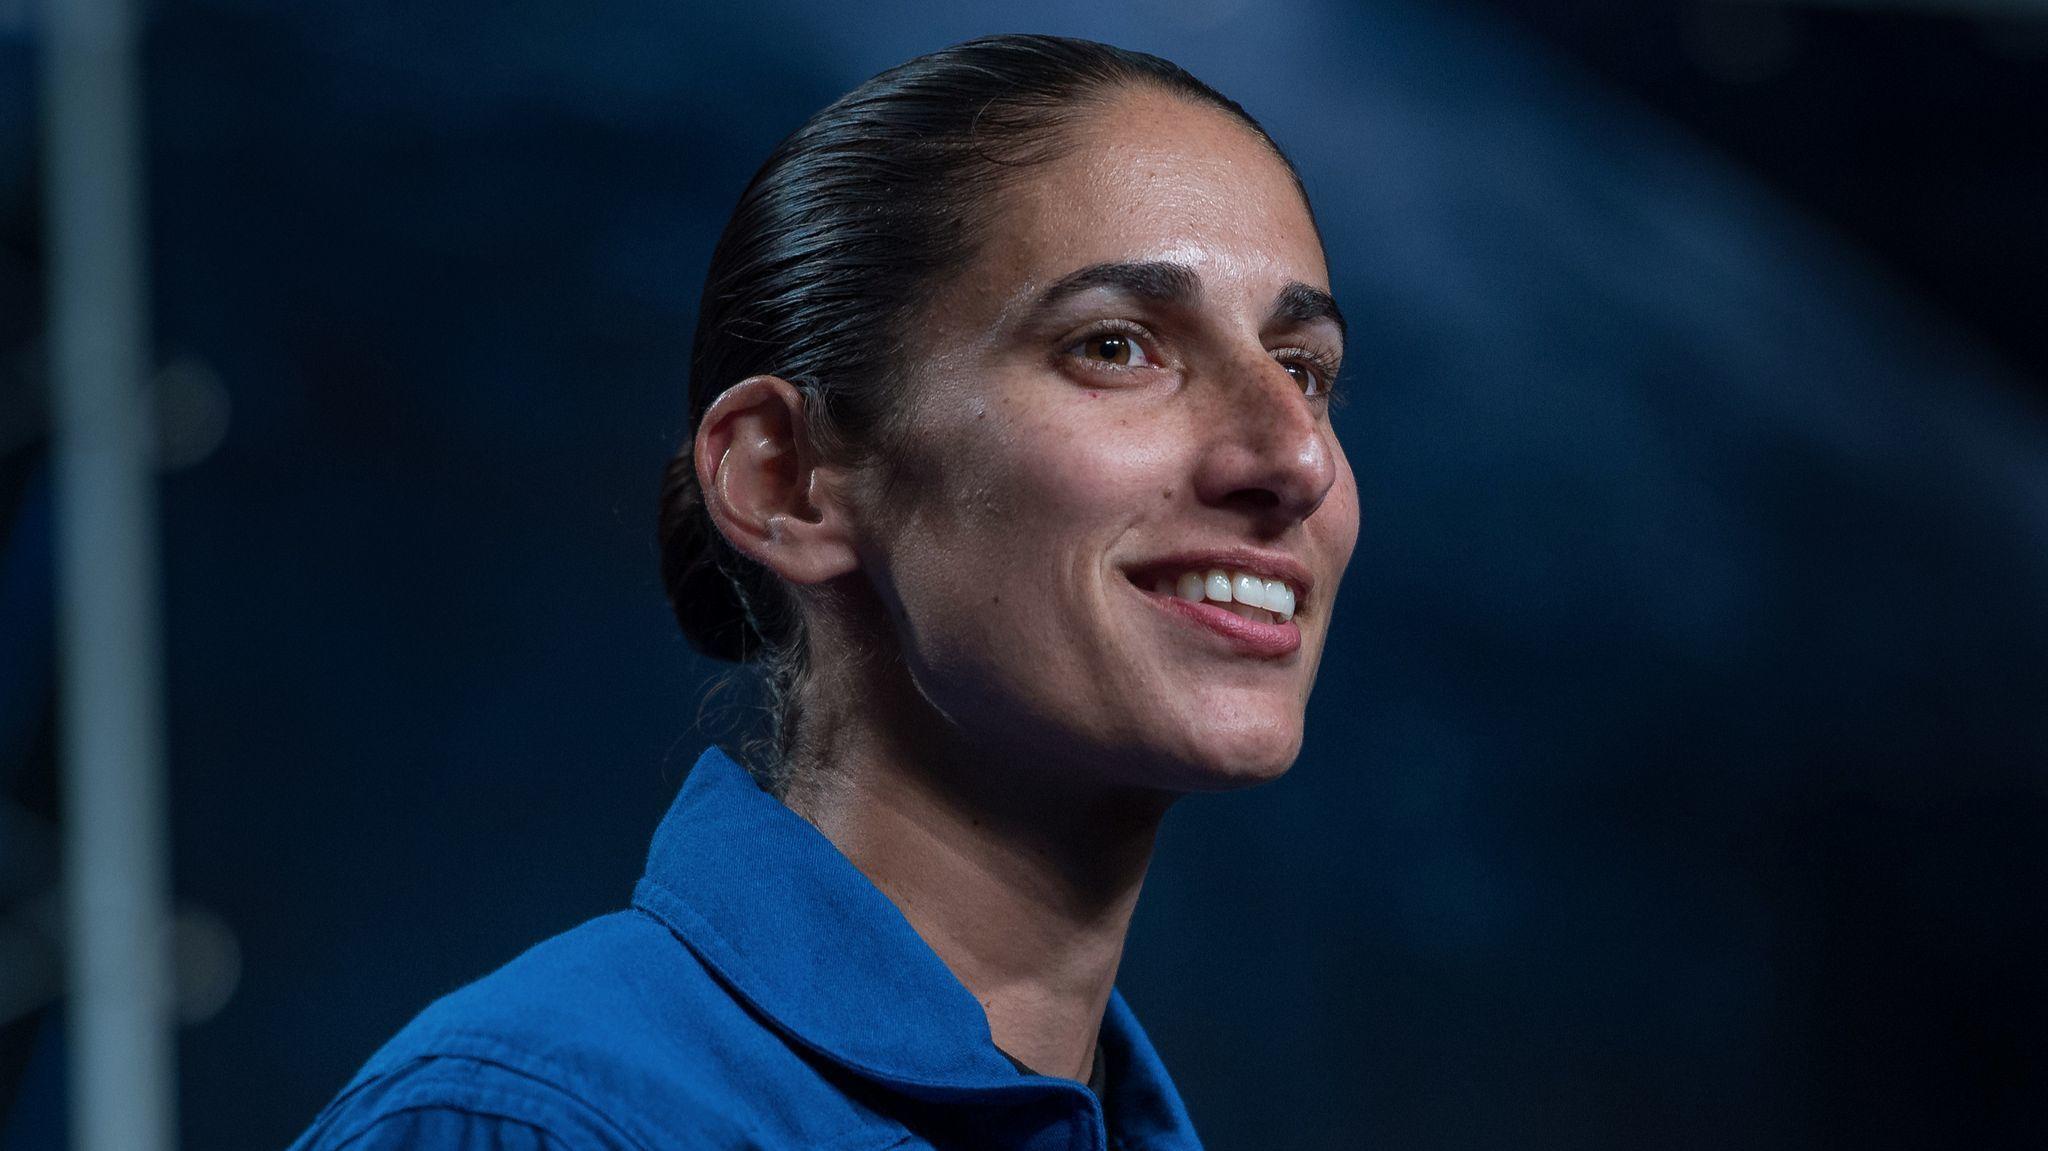 Astronaut Candidate Jasmin Moghbeli